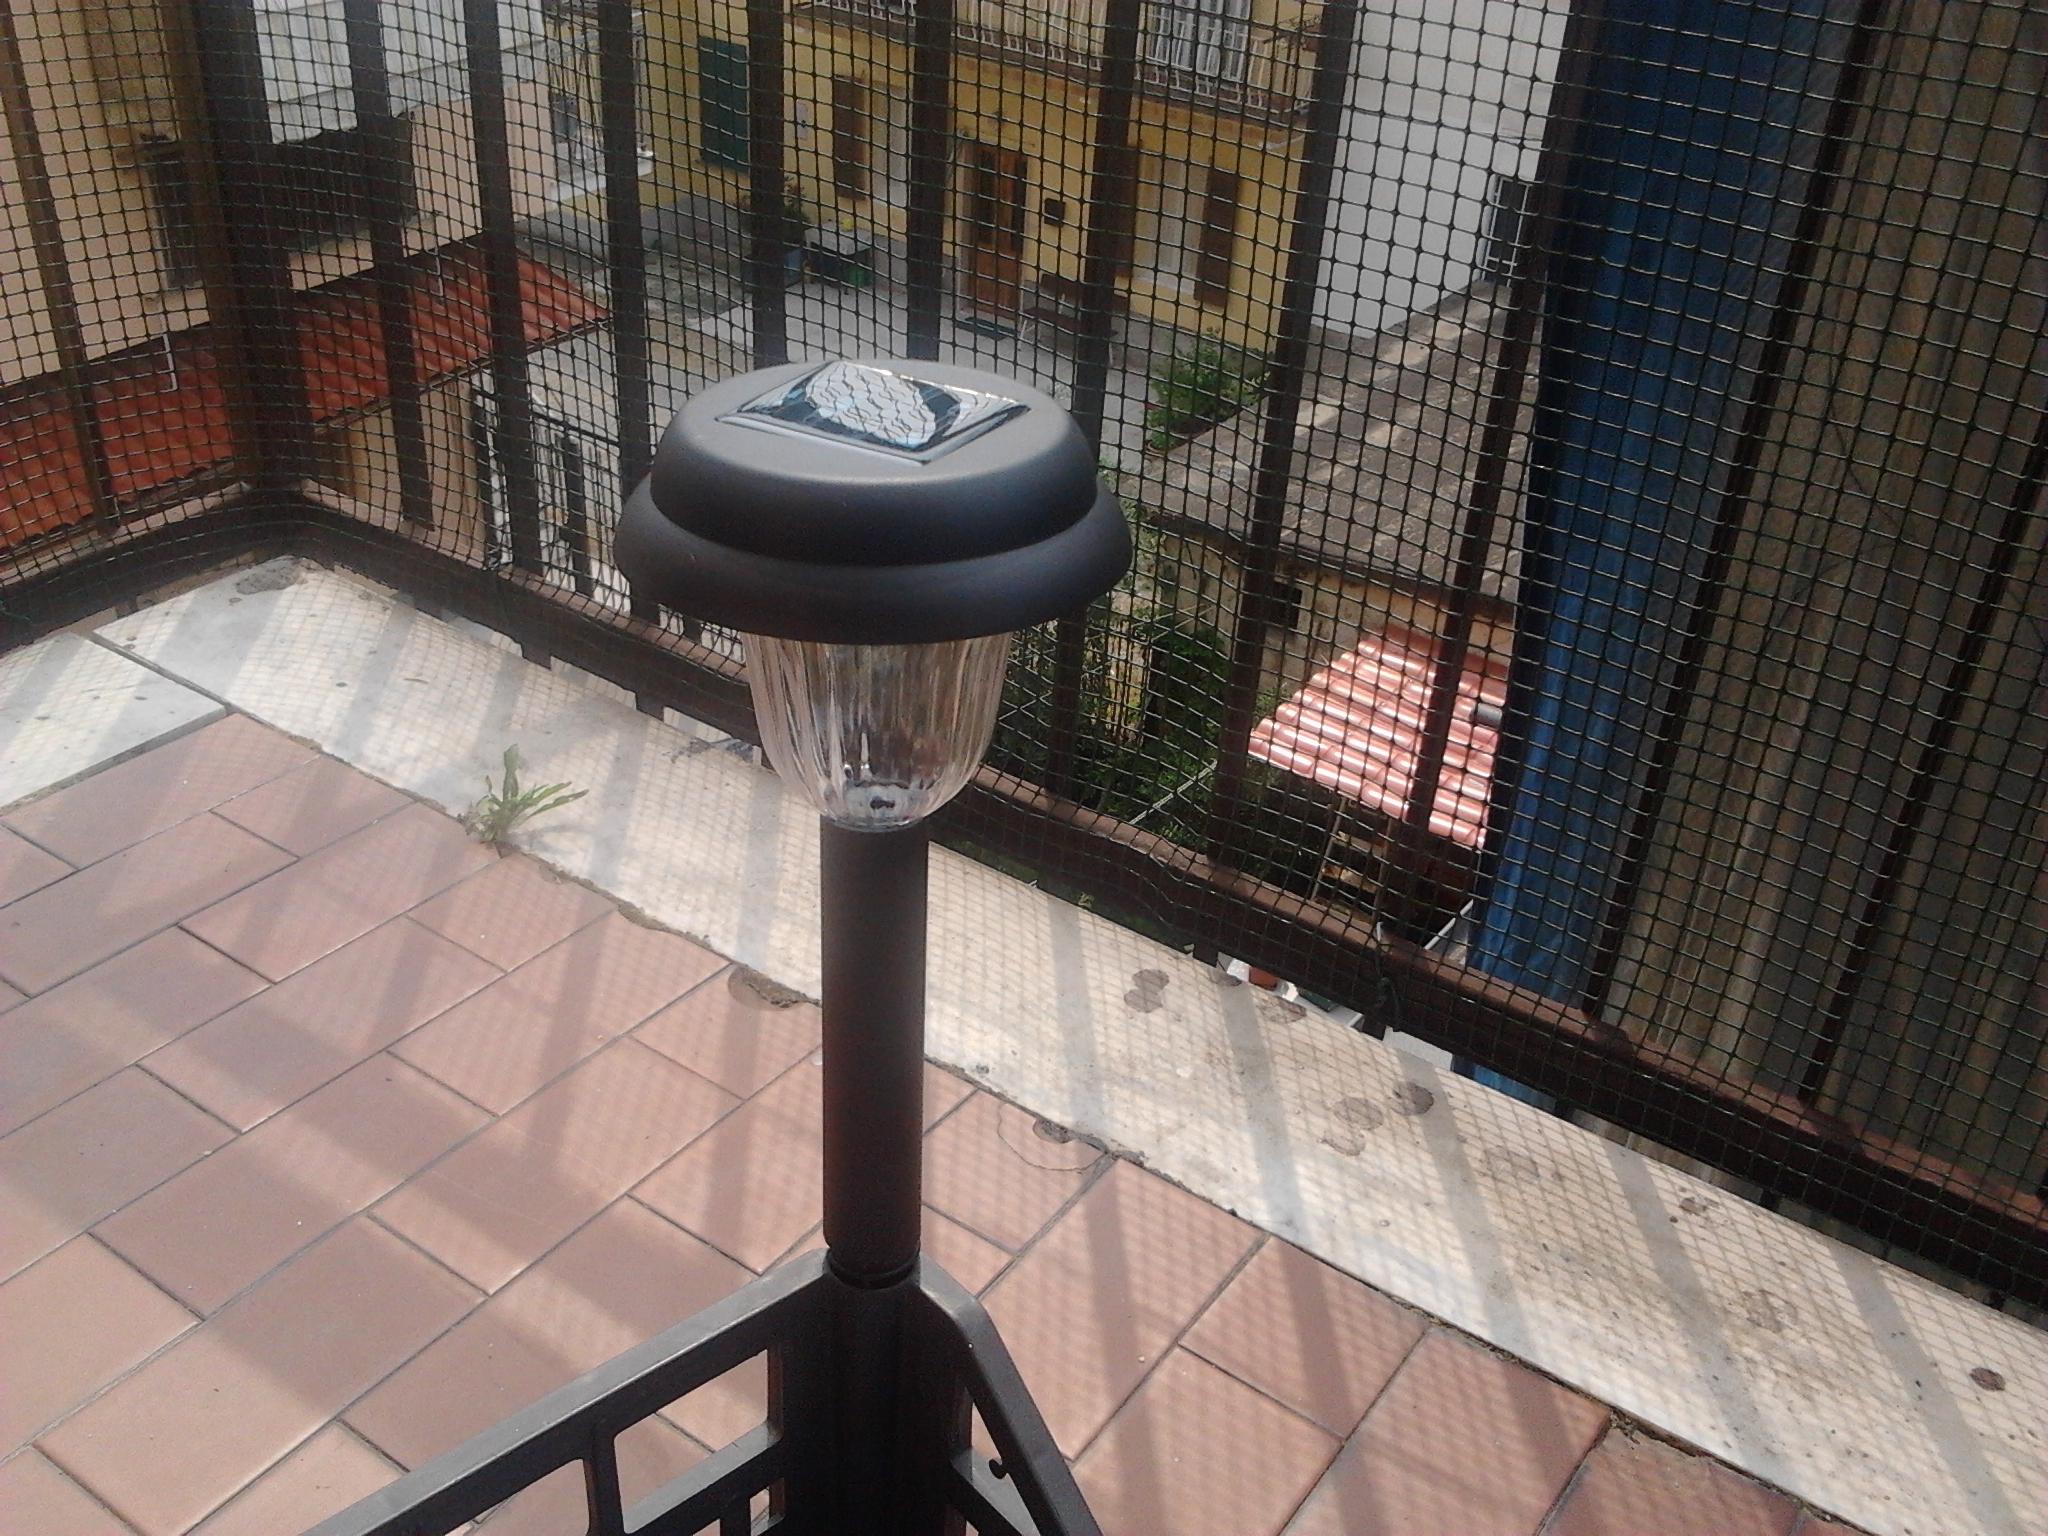 torcia solare